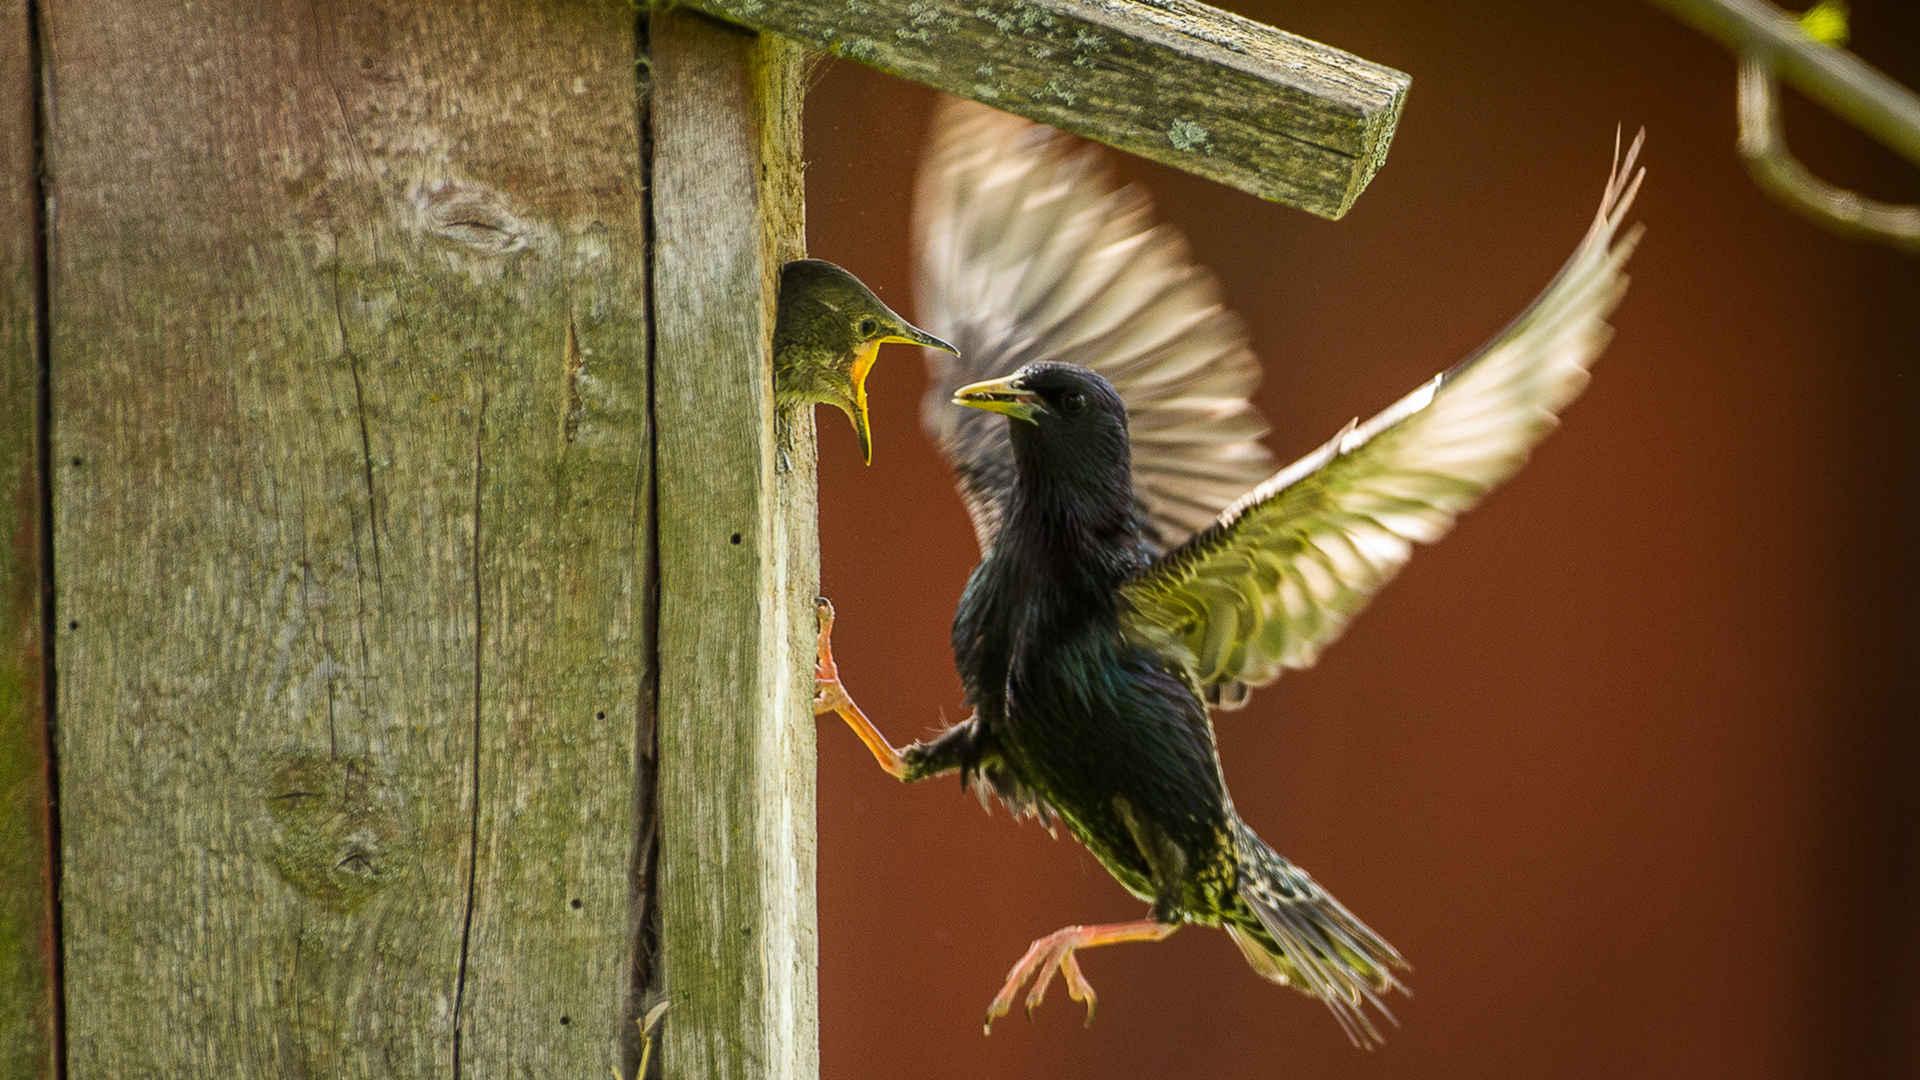 Vögel retten: Stare am Nistkasten